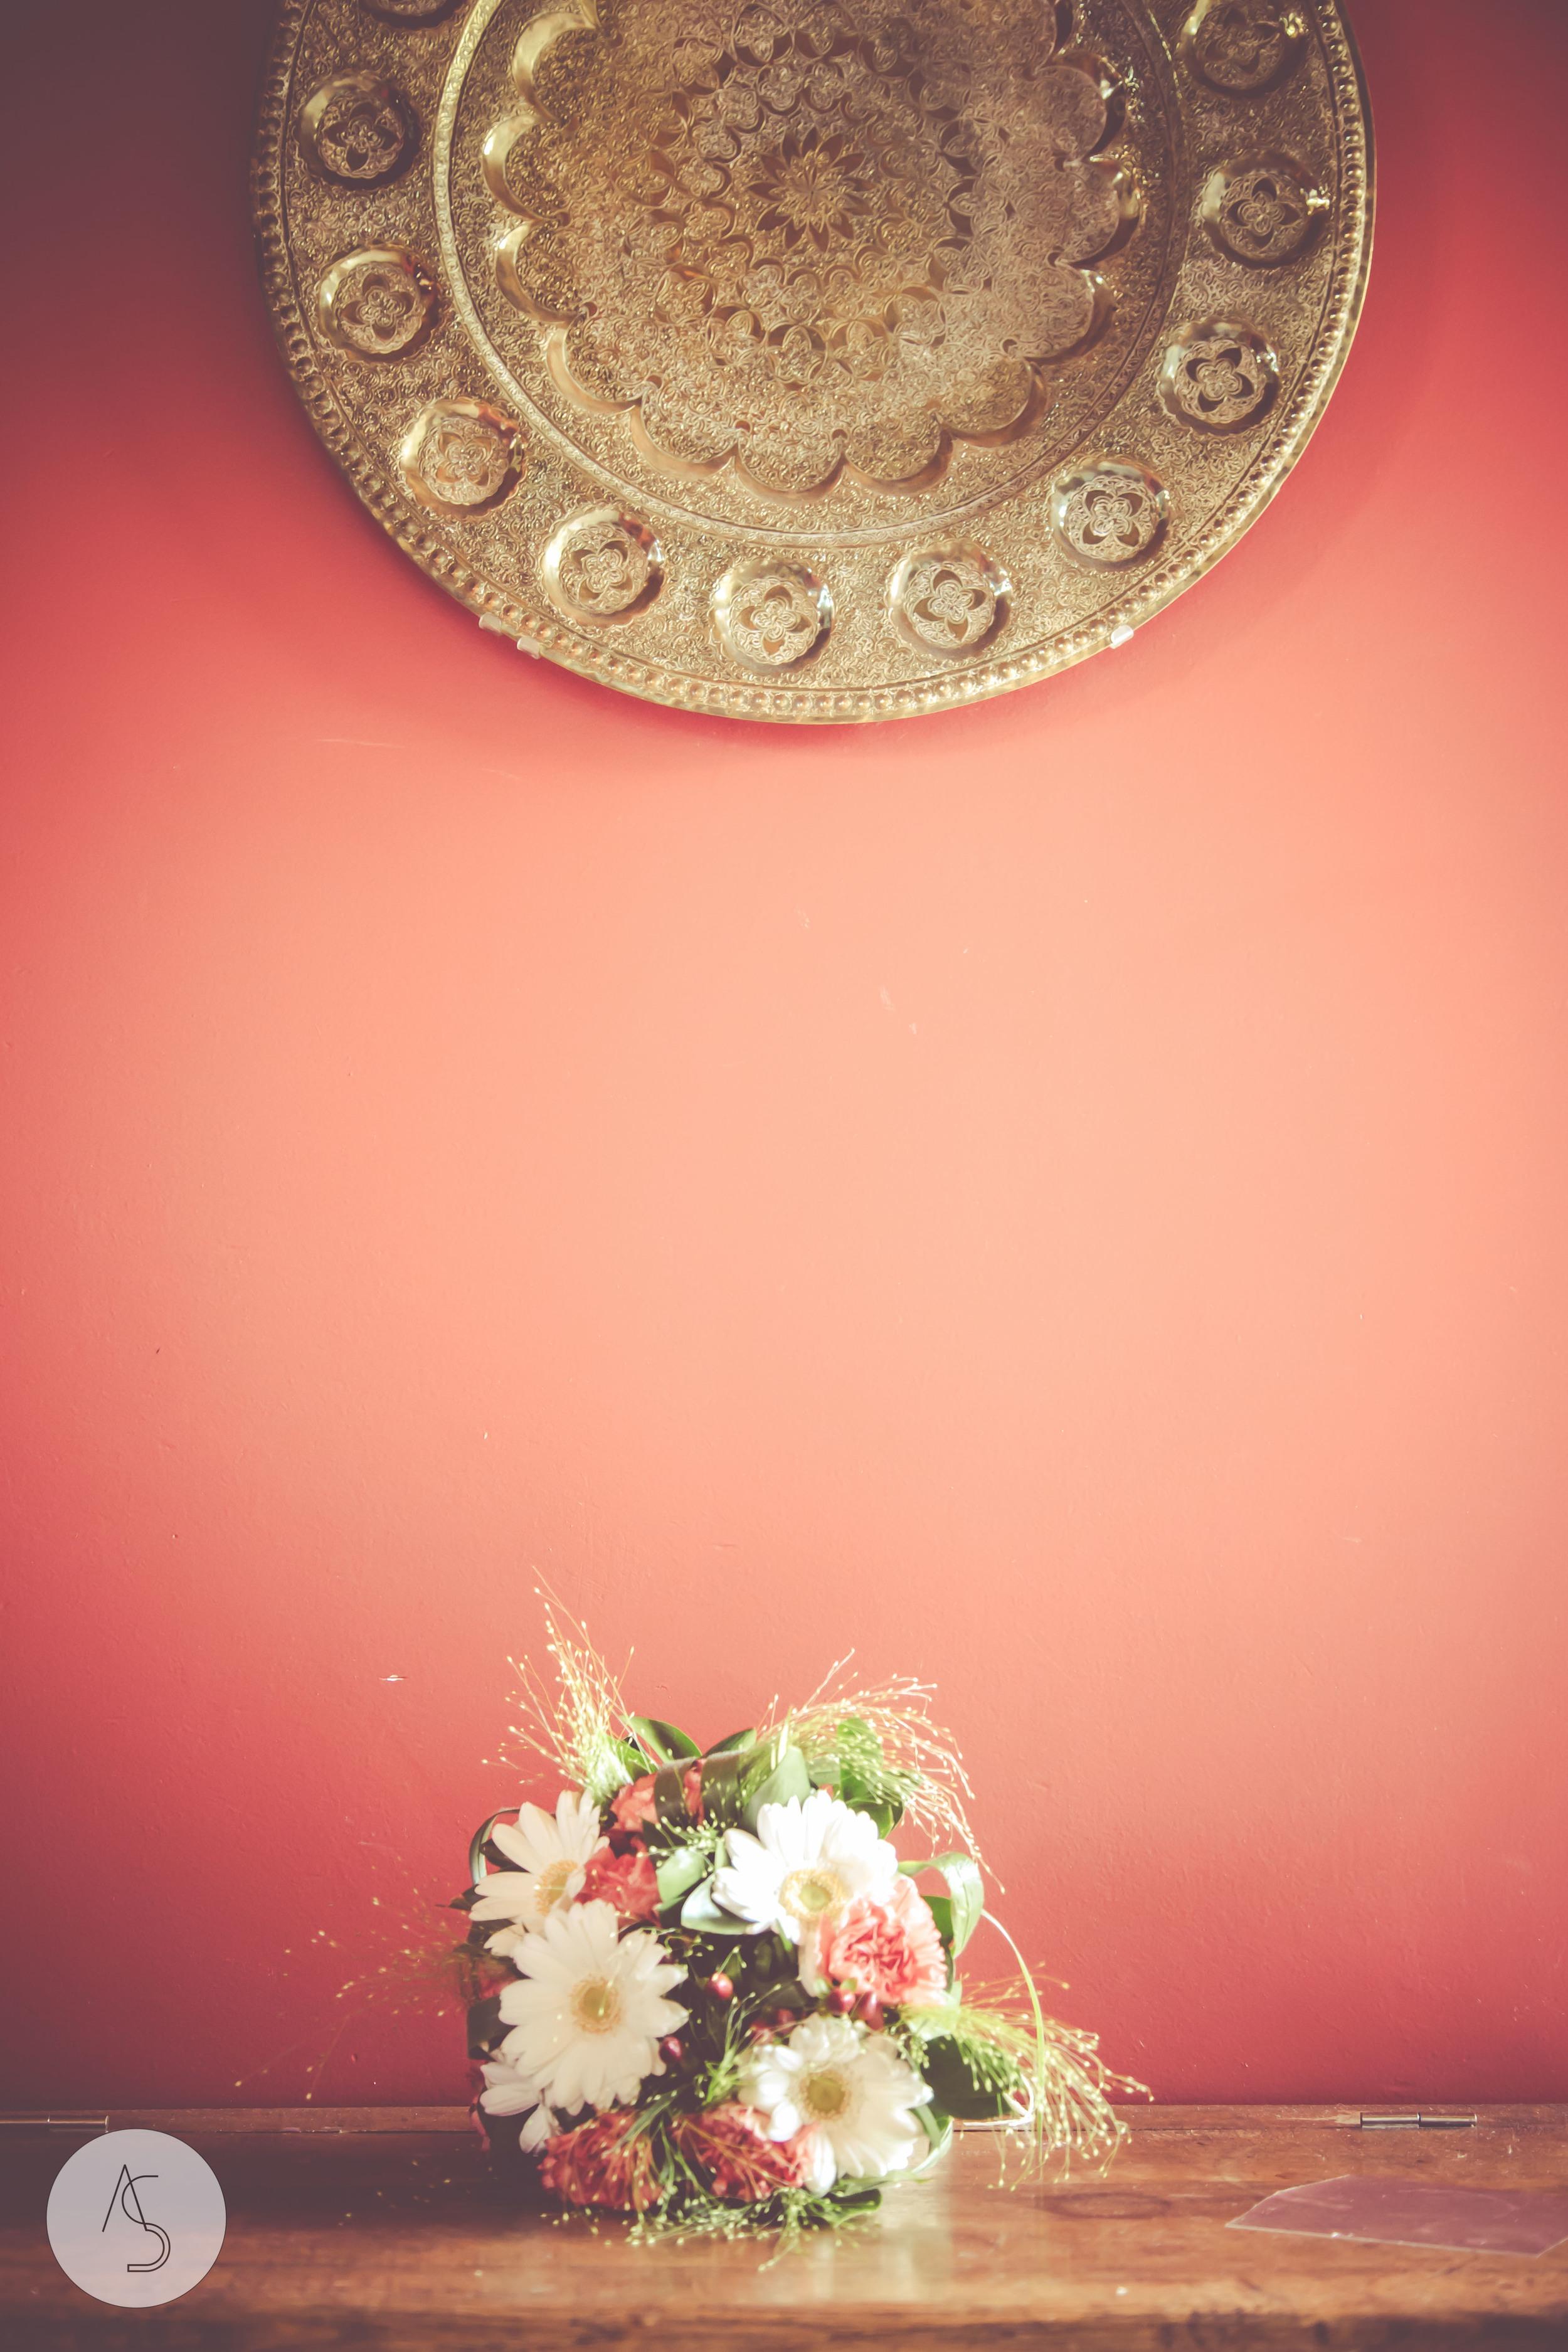 photographe mariage - Grenoble - Rhone Alpes - Adriana Salazar photo-39.jpg